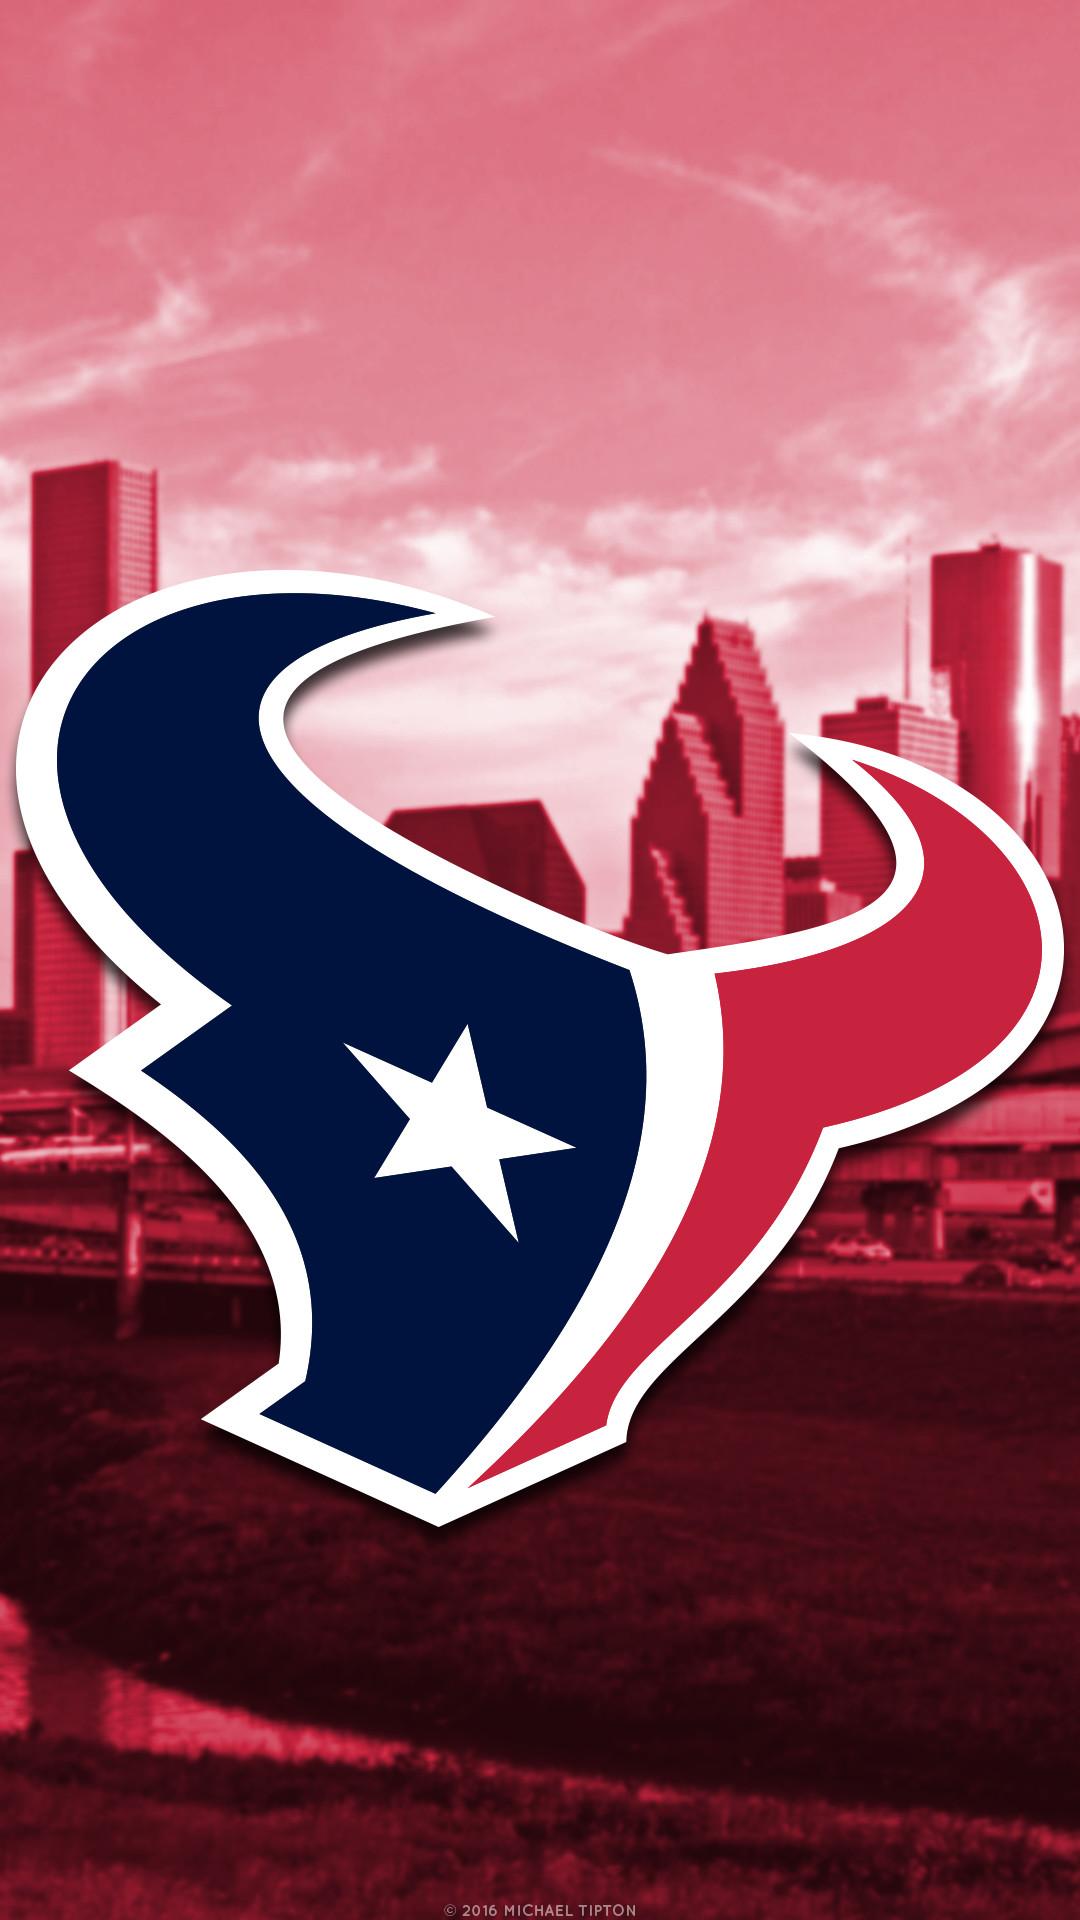 Houston Texans iPhone Wallpaper (66+